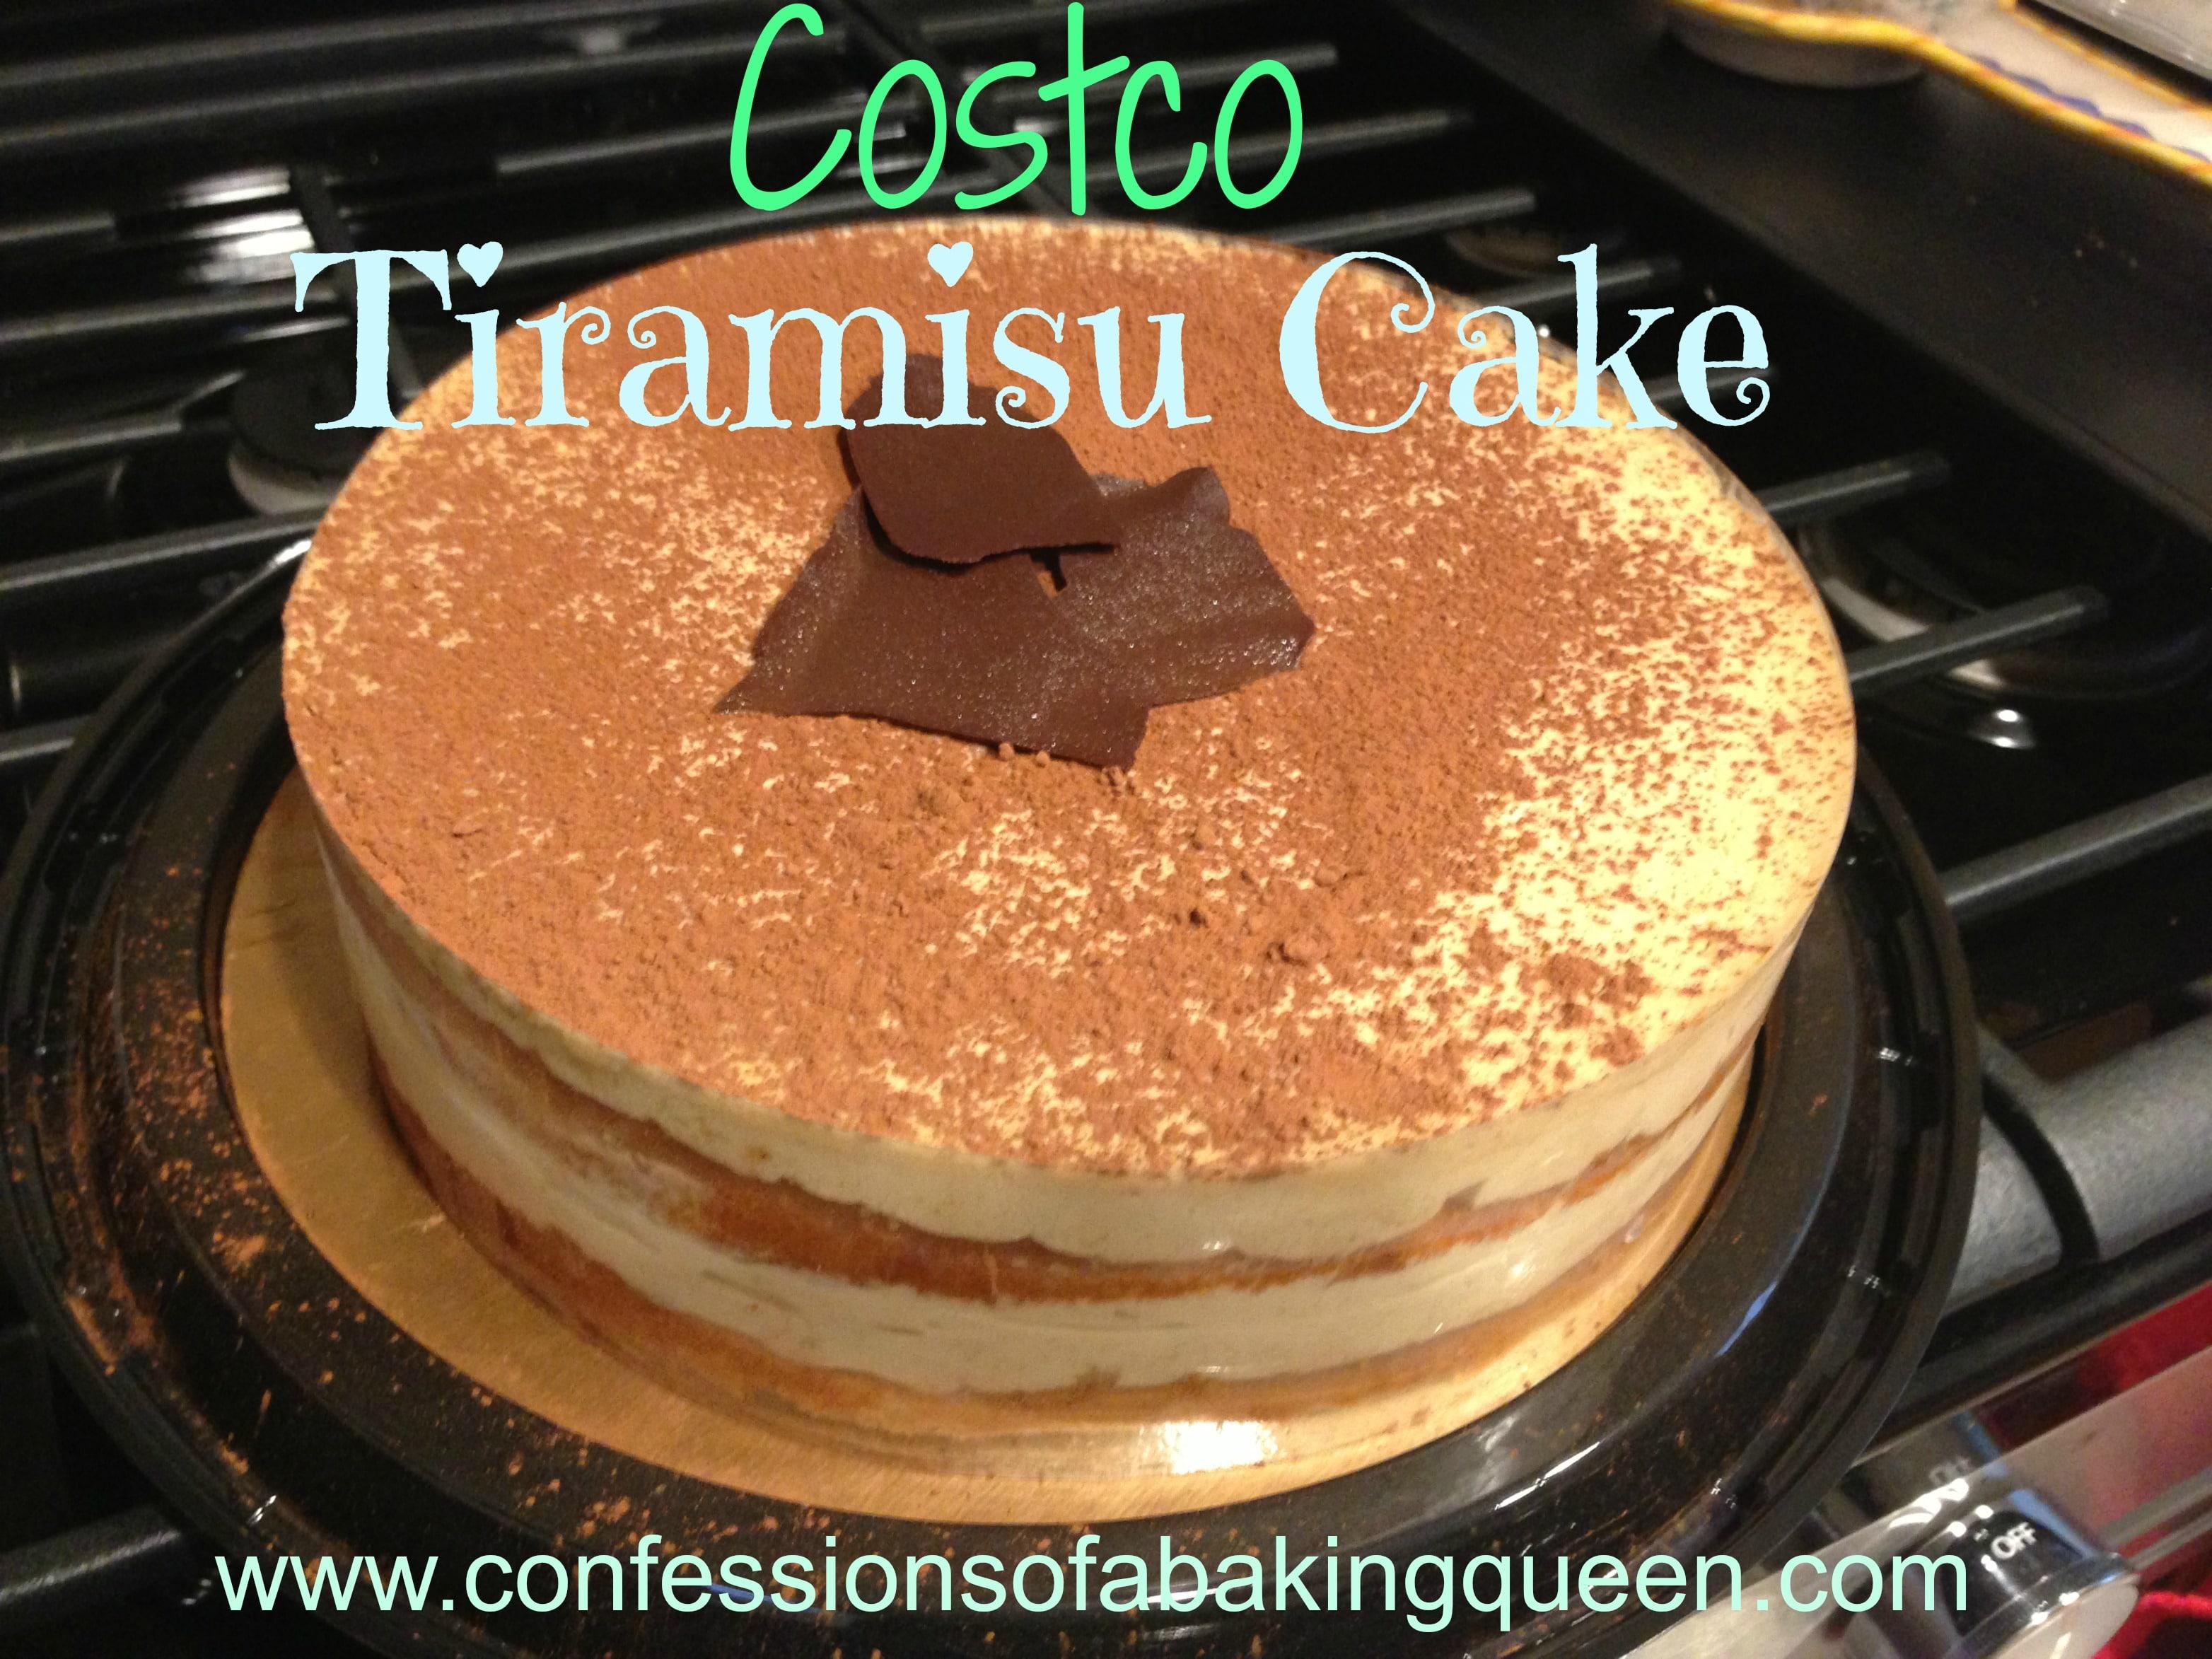 Tiramisu Costco Cake www.confessionsofabakingqueen.com